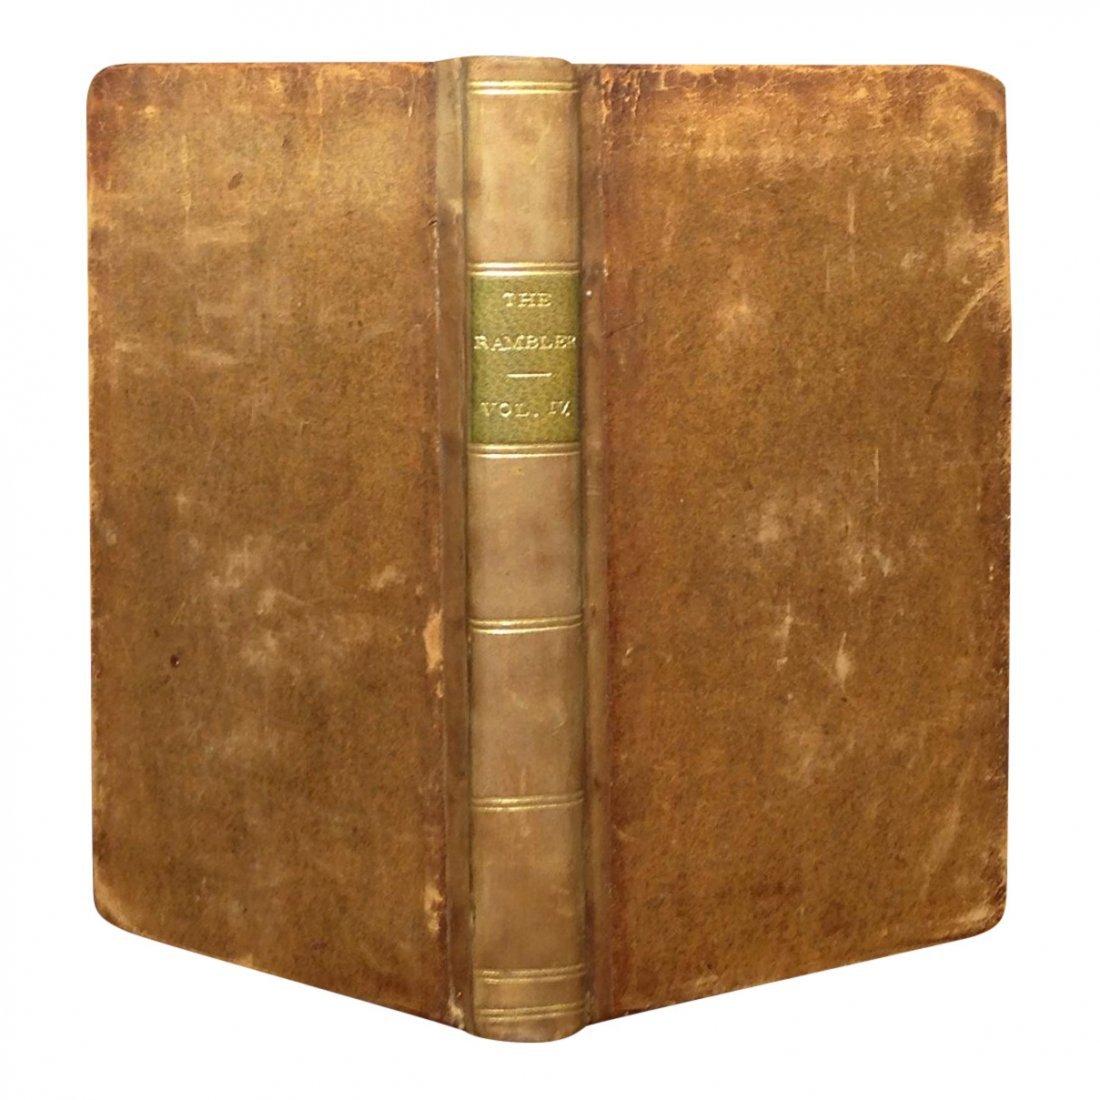 The Rambler Volume IV by Samuel Johnson